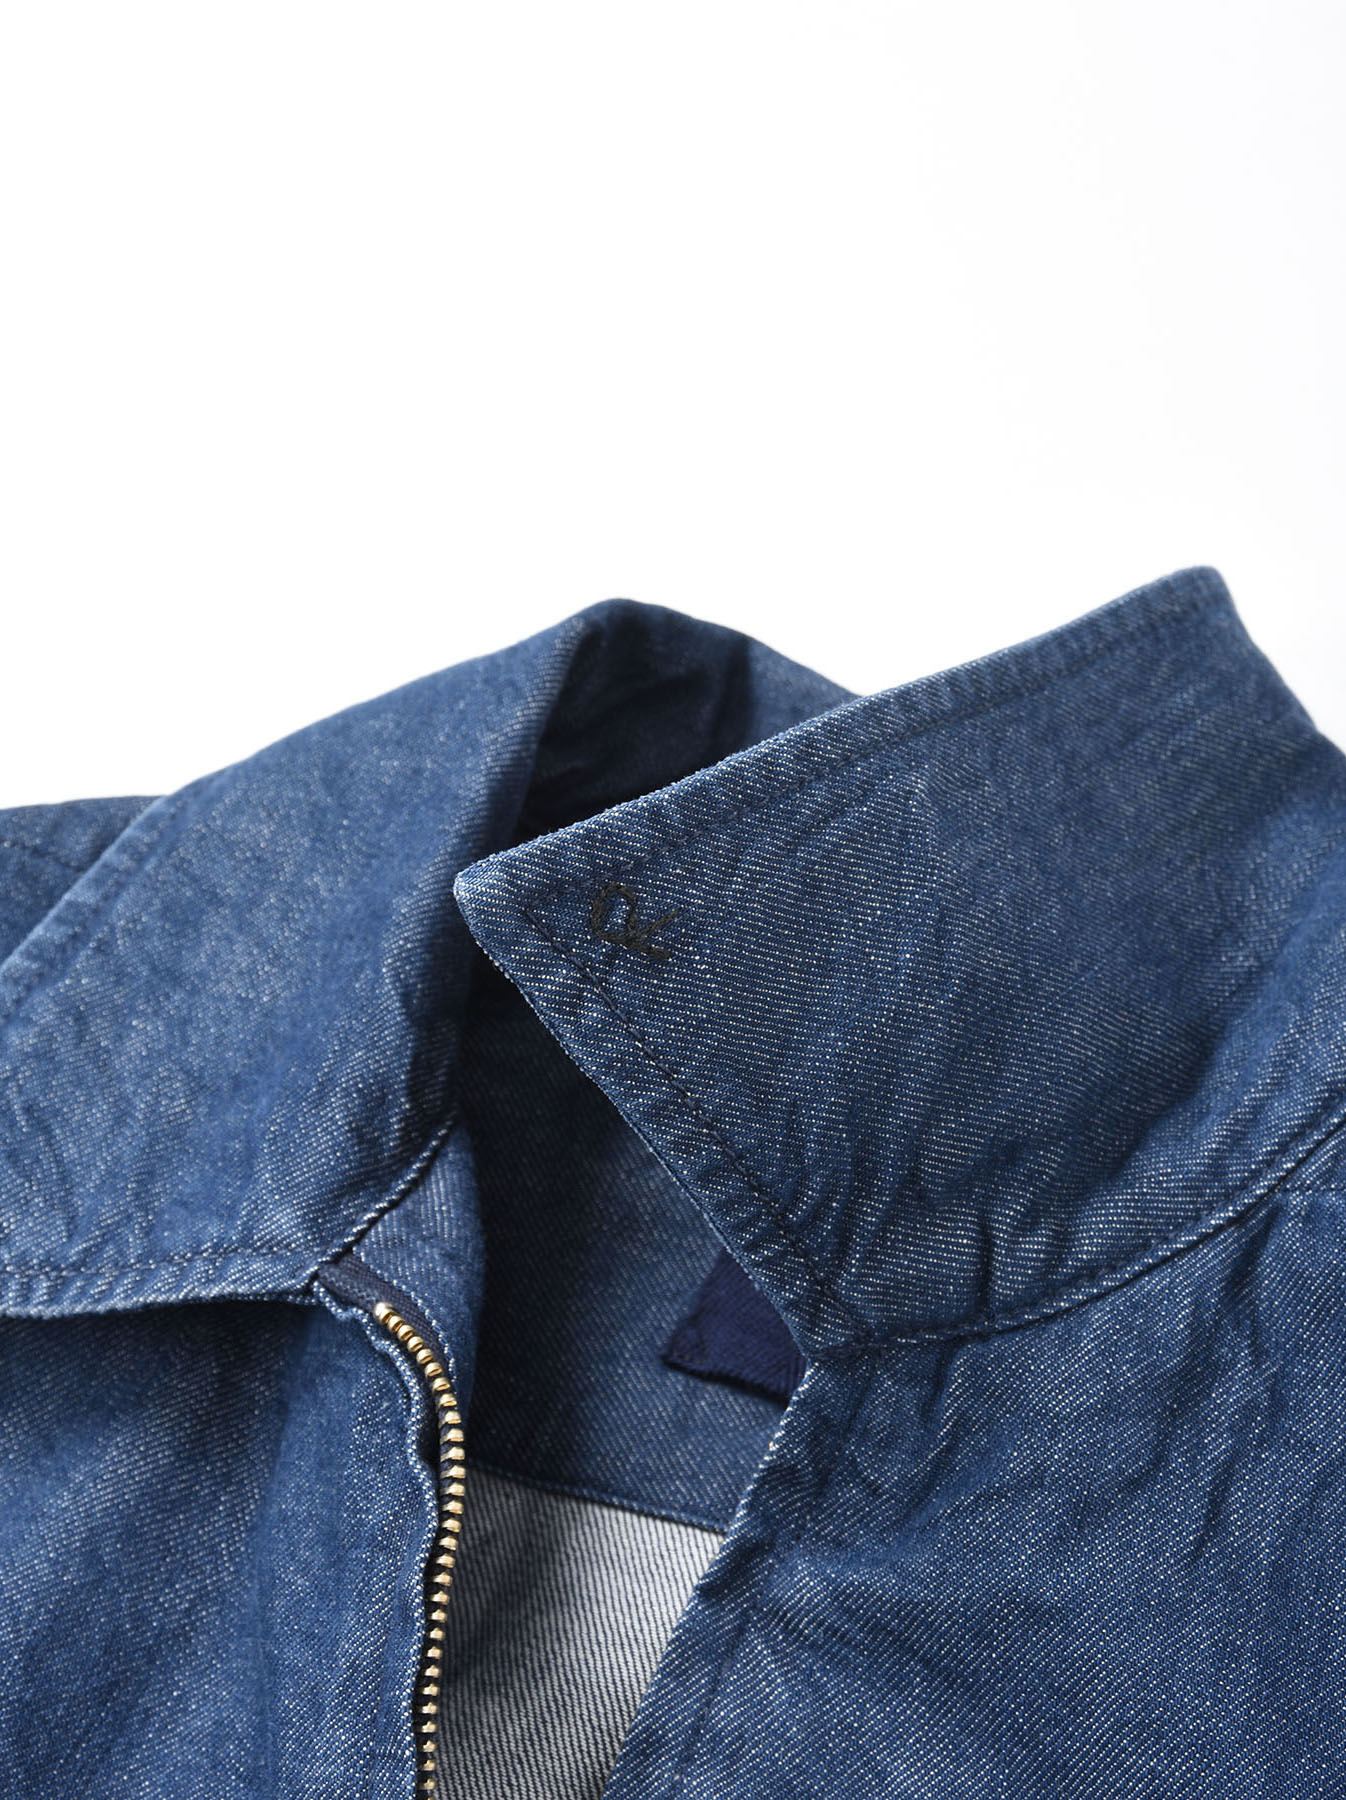 Distressed Mugi Denim Jacket-6